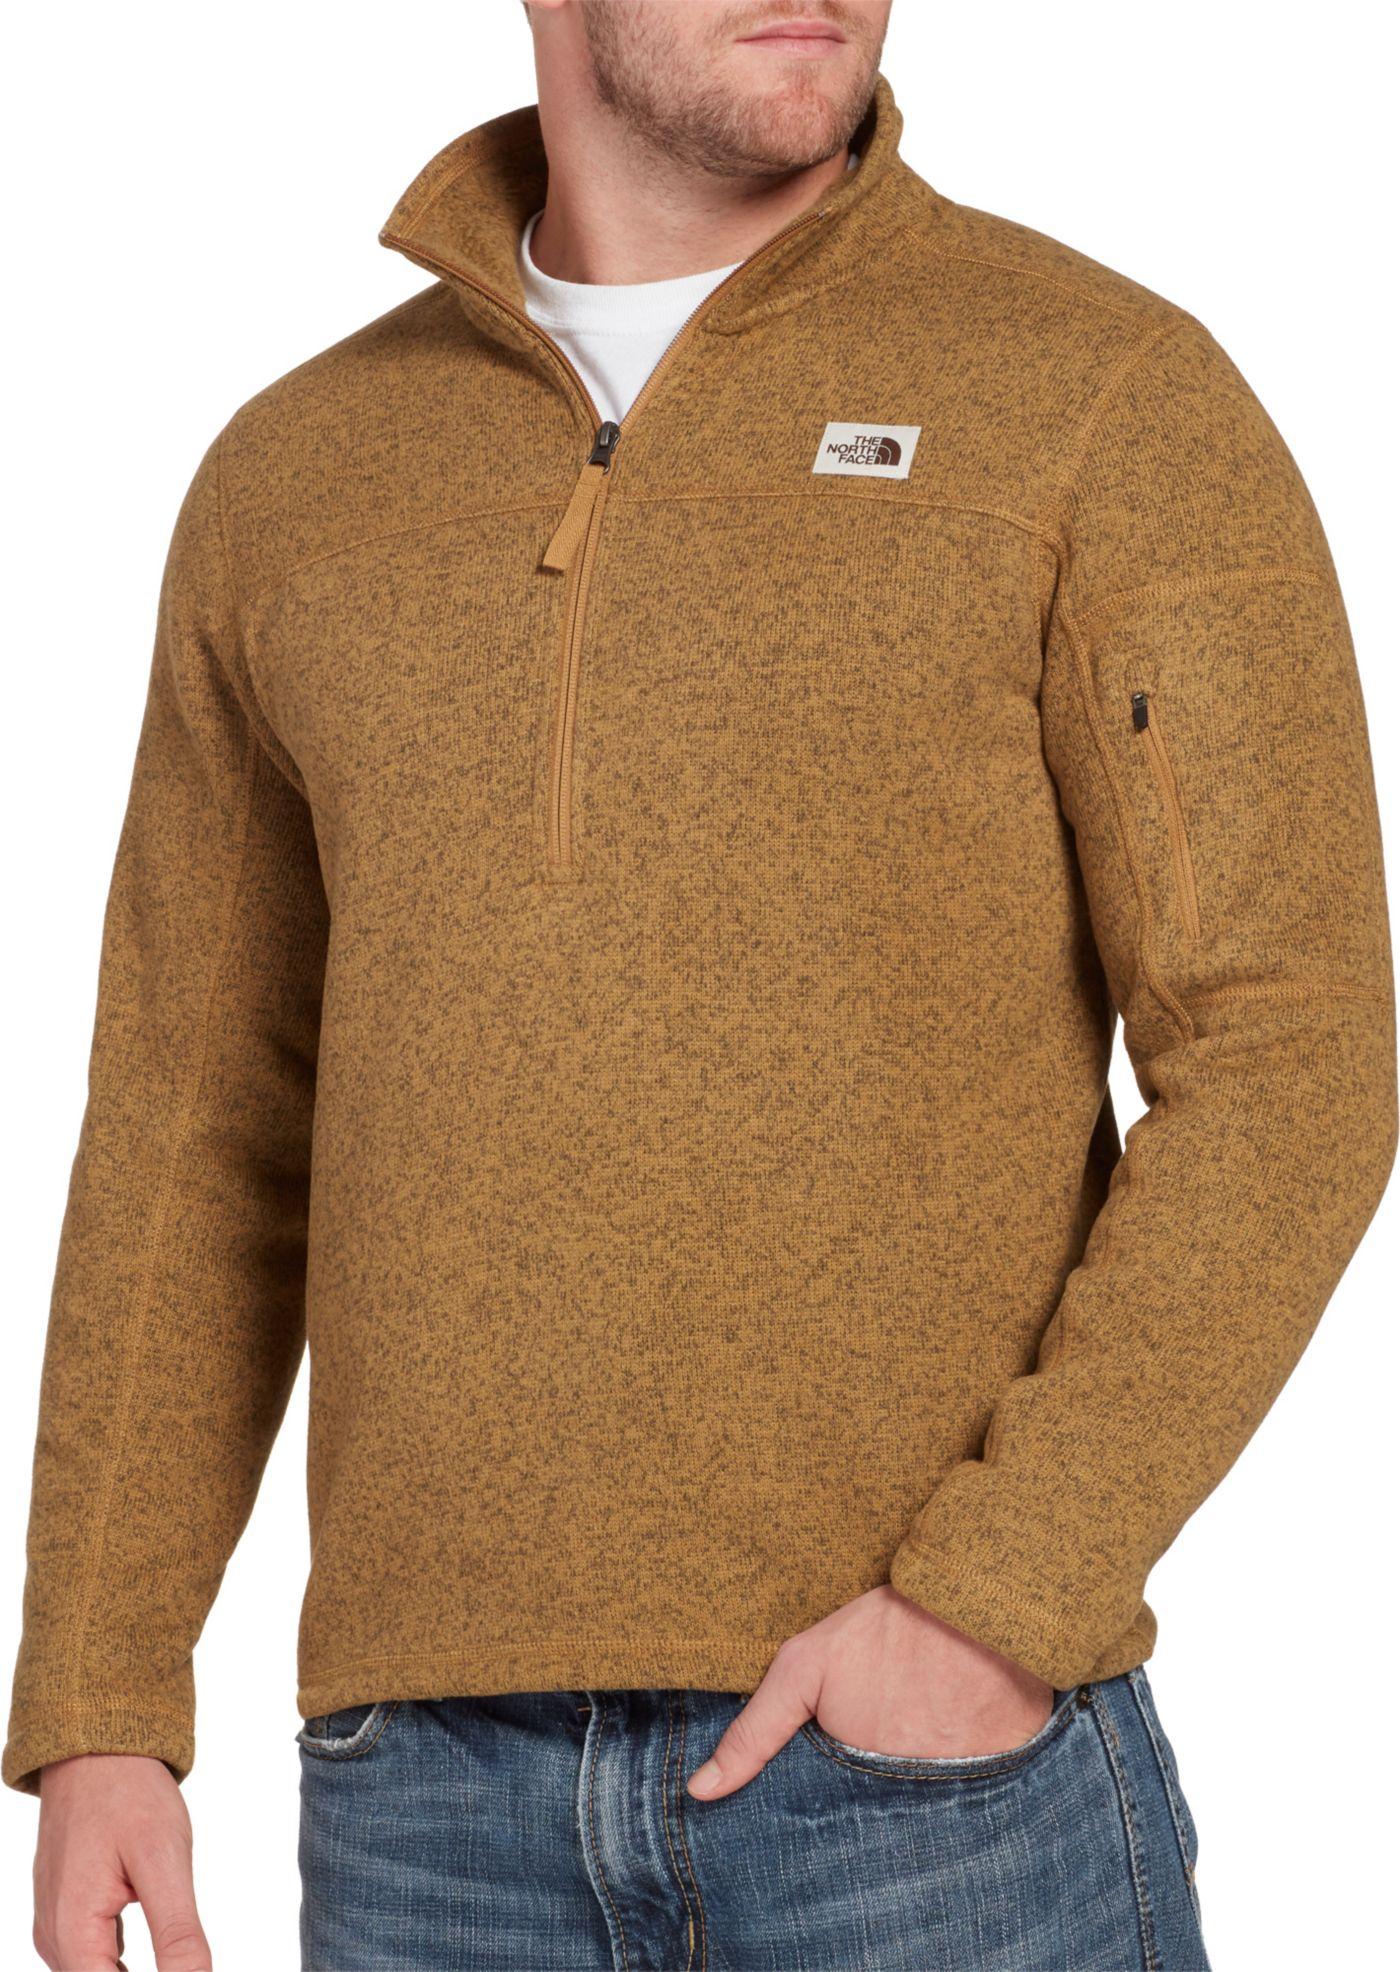 The North Face Men's Gordon Lyons ¼ Zip Pullover